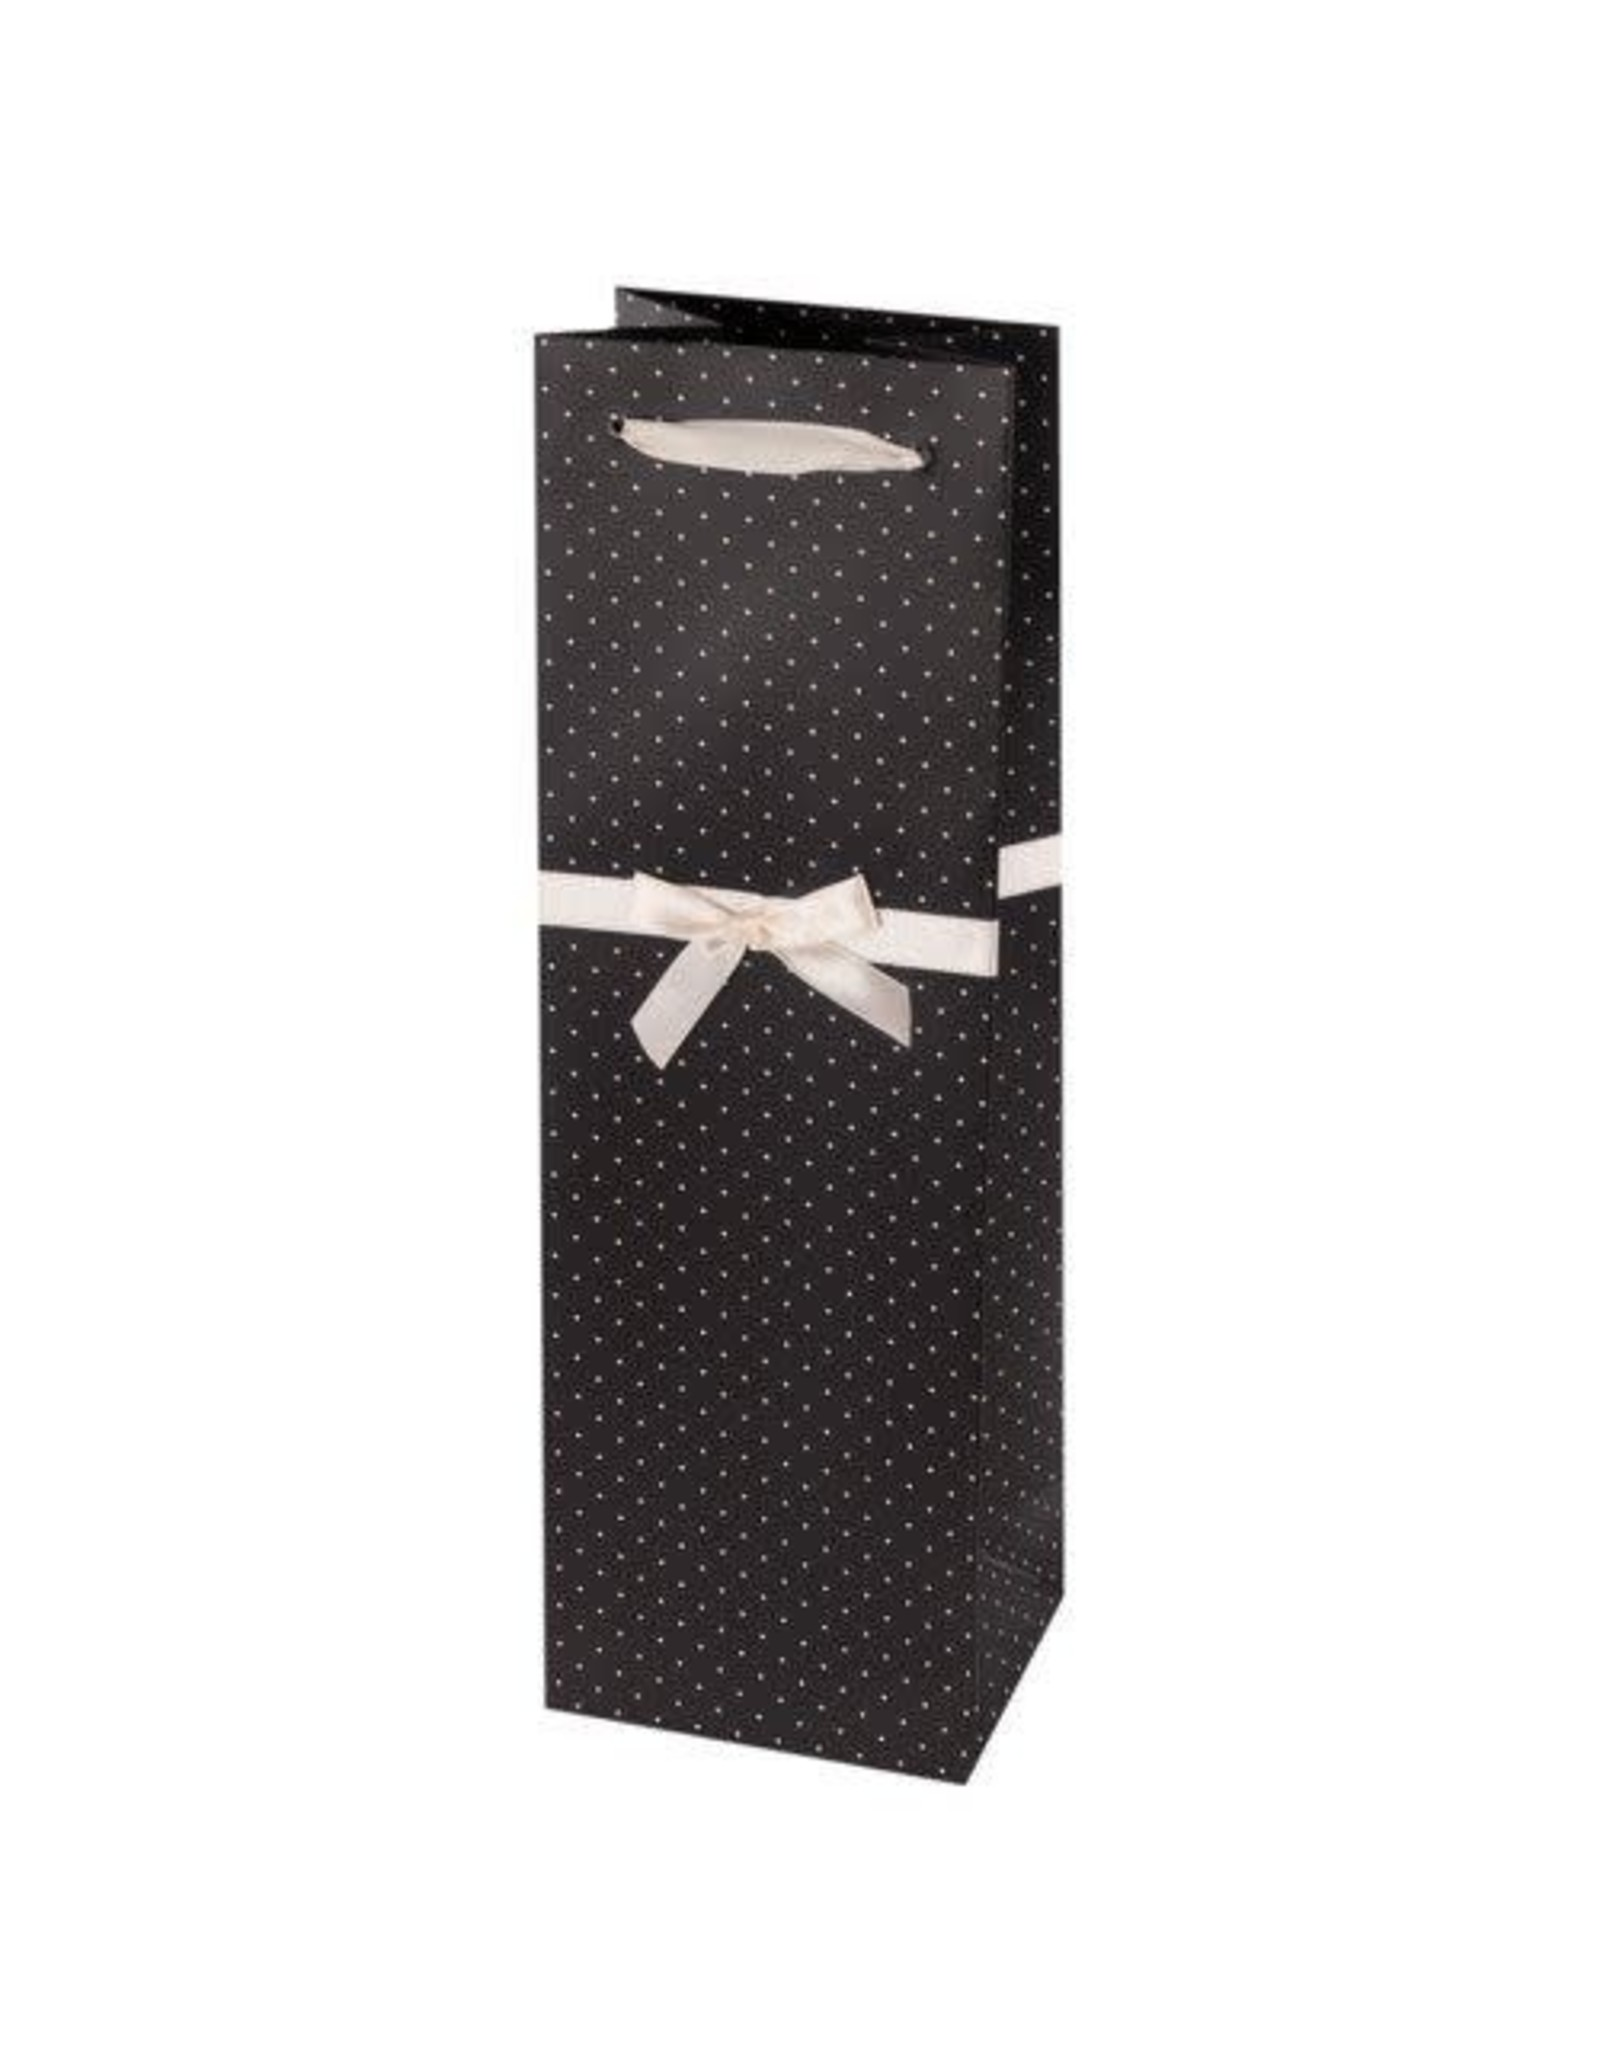 USA Elegant Black And White Dots Wine Bag